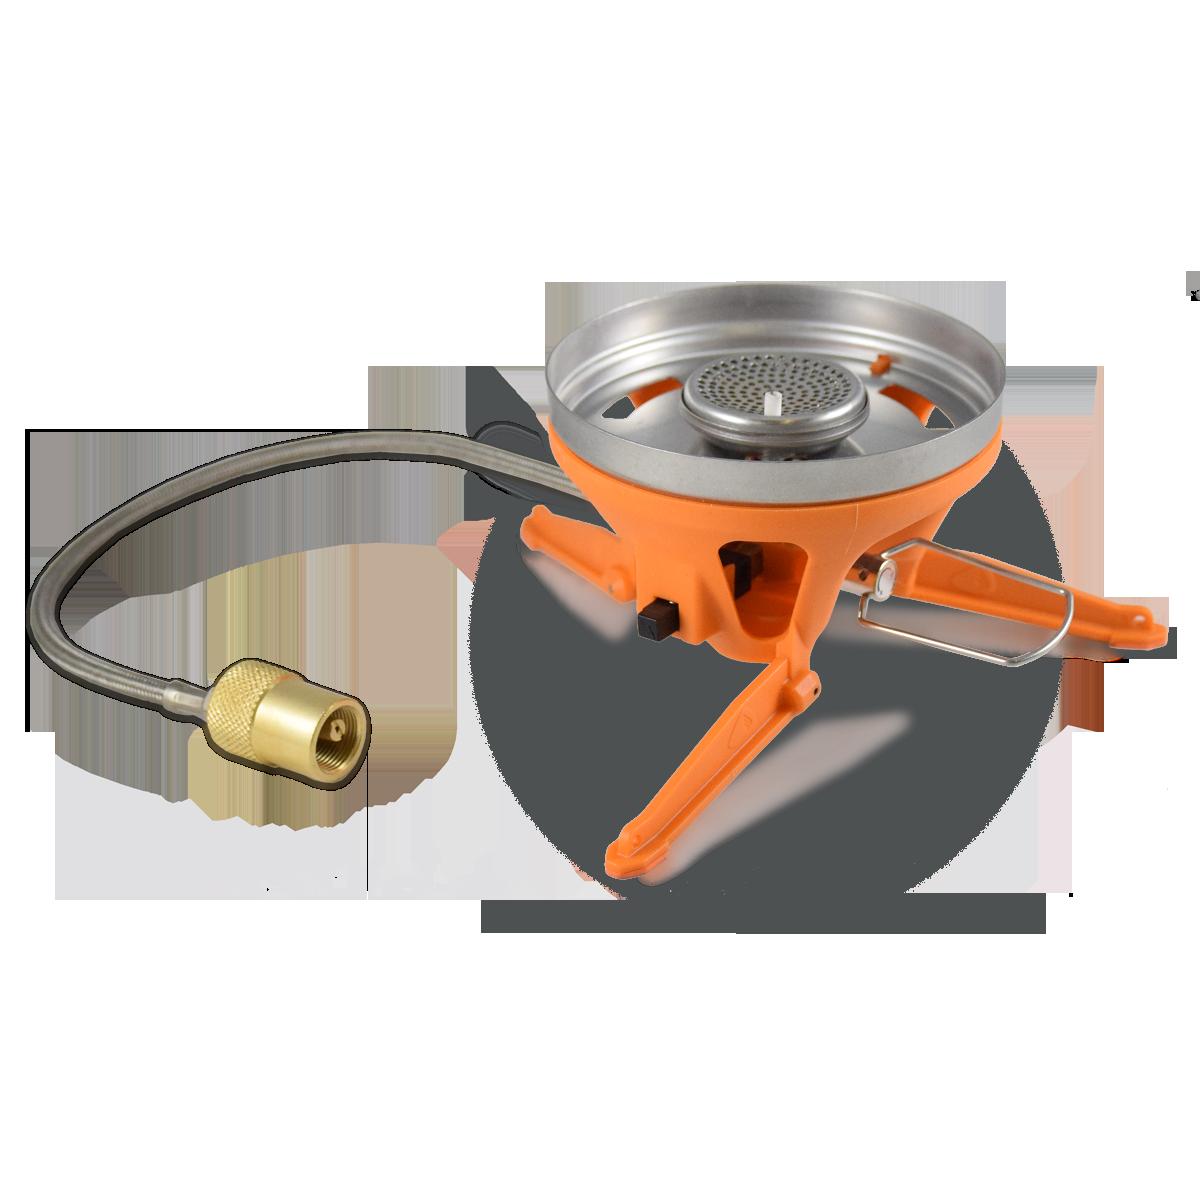 JetBoil Luna Satellite Burner